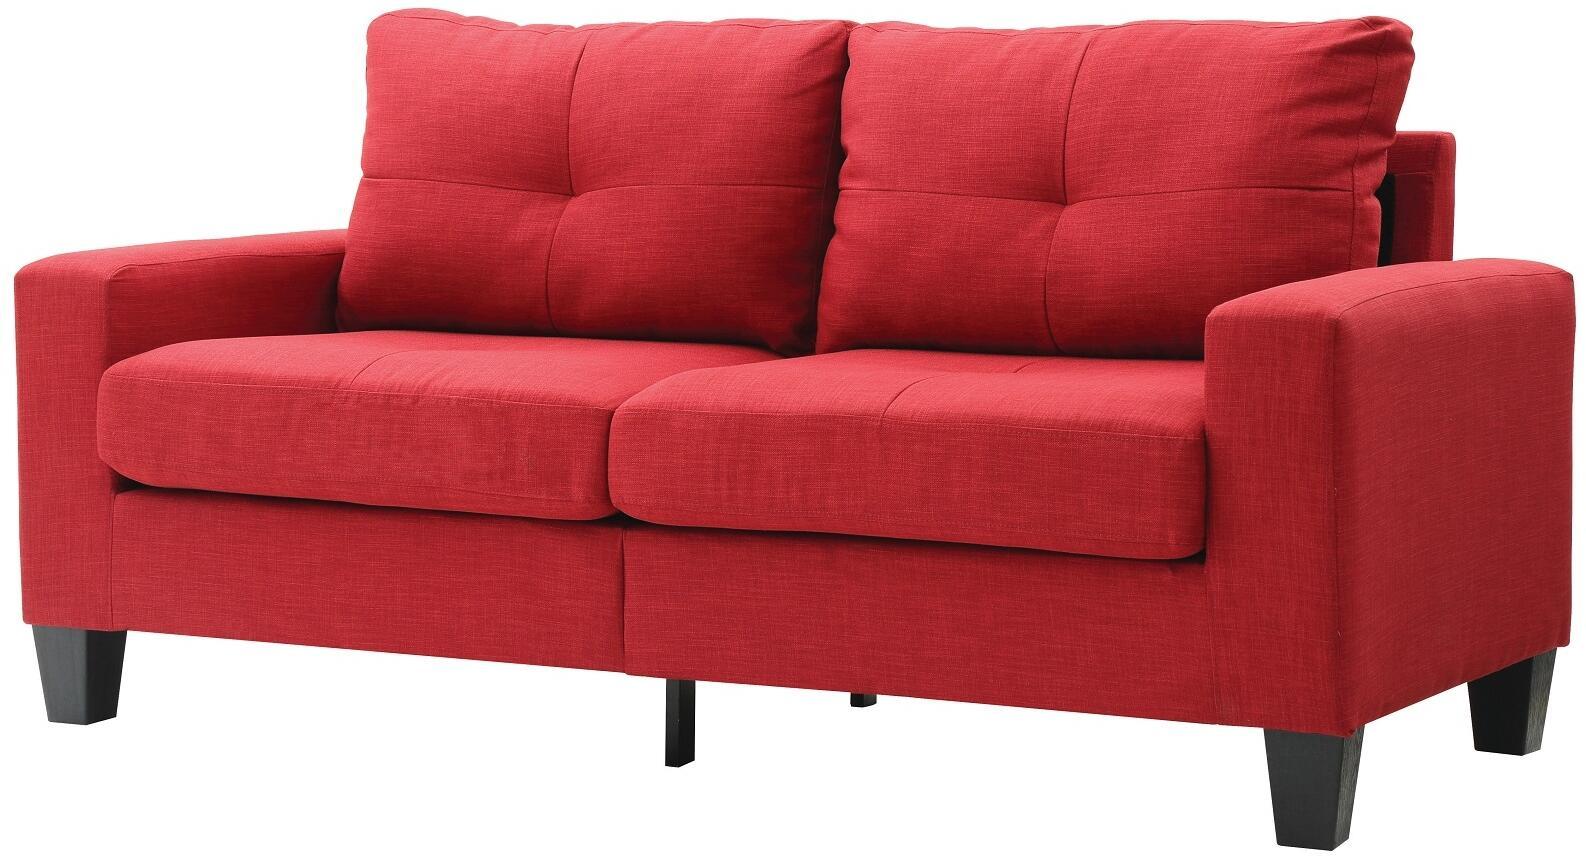 Glory furniture g474as newbury series modular fabric sofa for Furniture connection